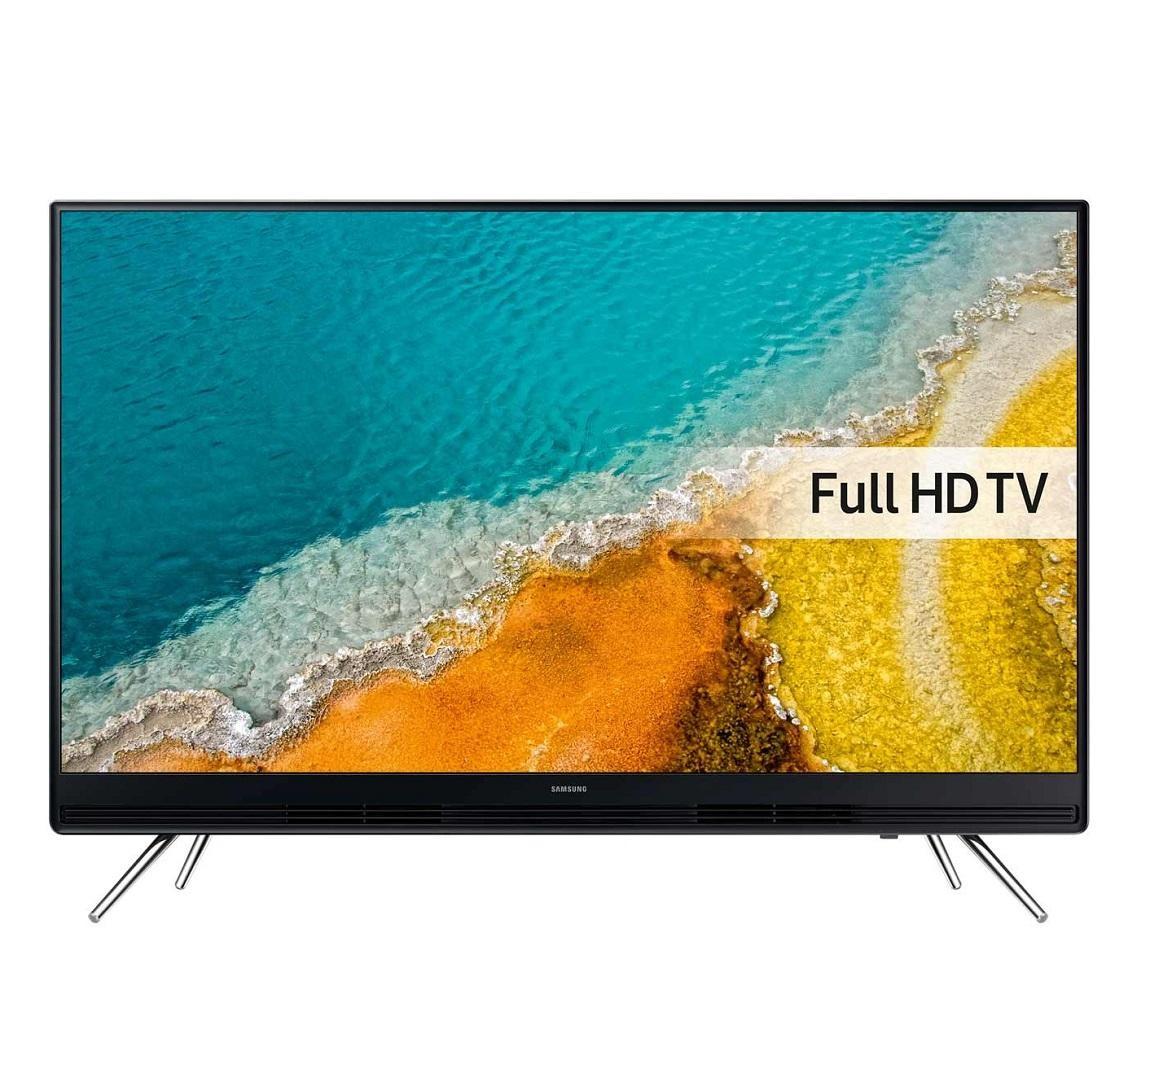 Samsung-UE40K5100-tv-front.jpg